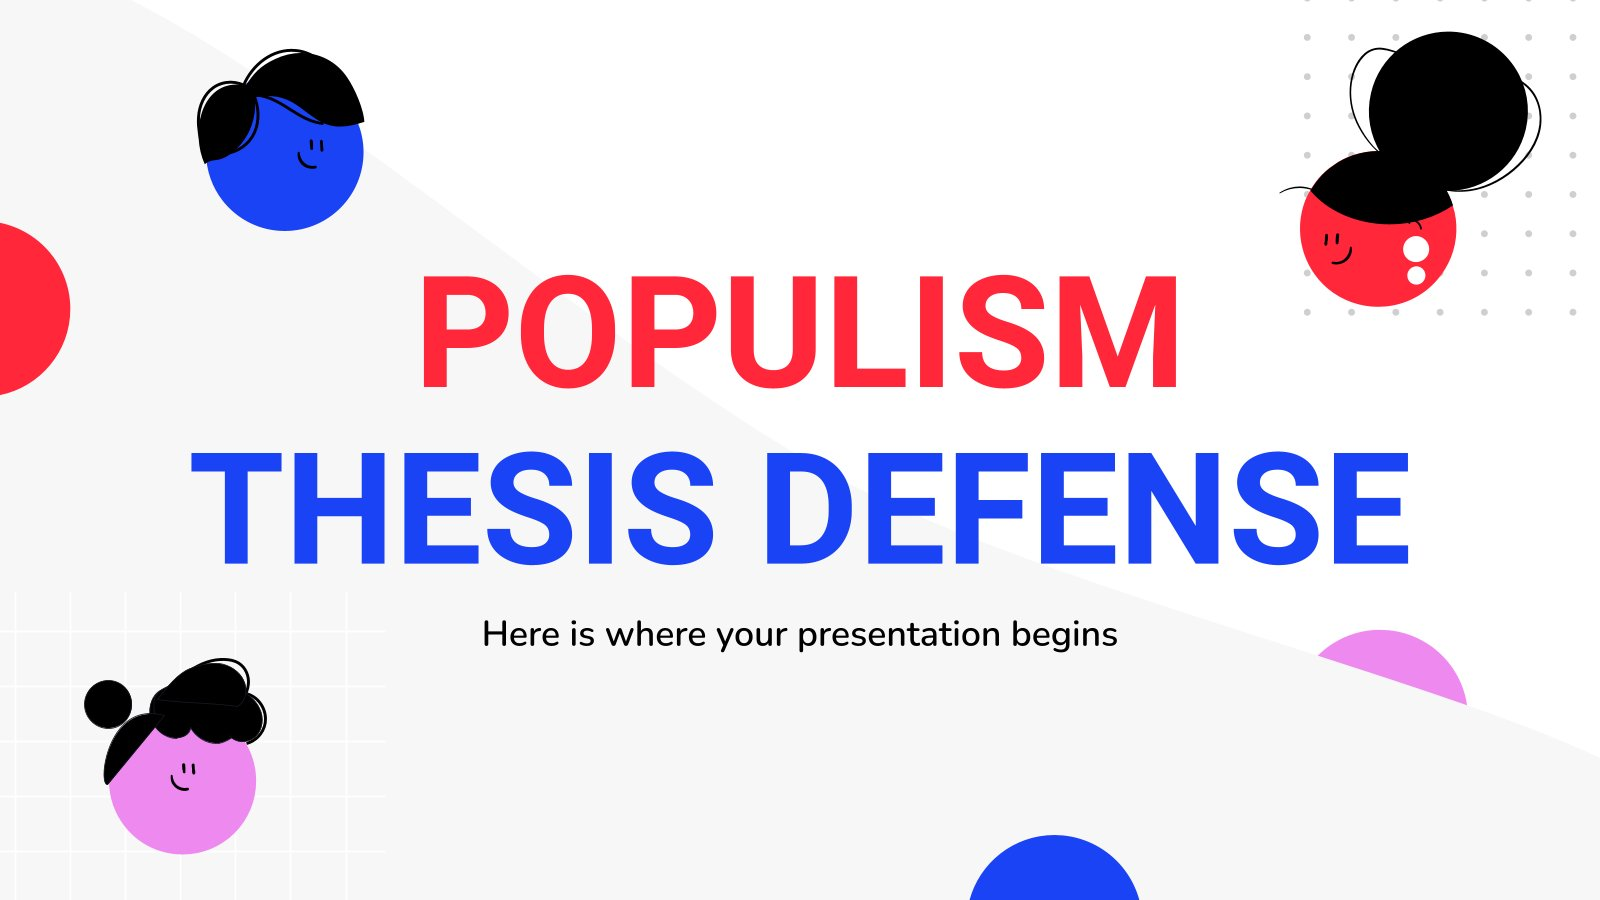 Populism Thesis Defense presentation template